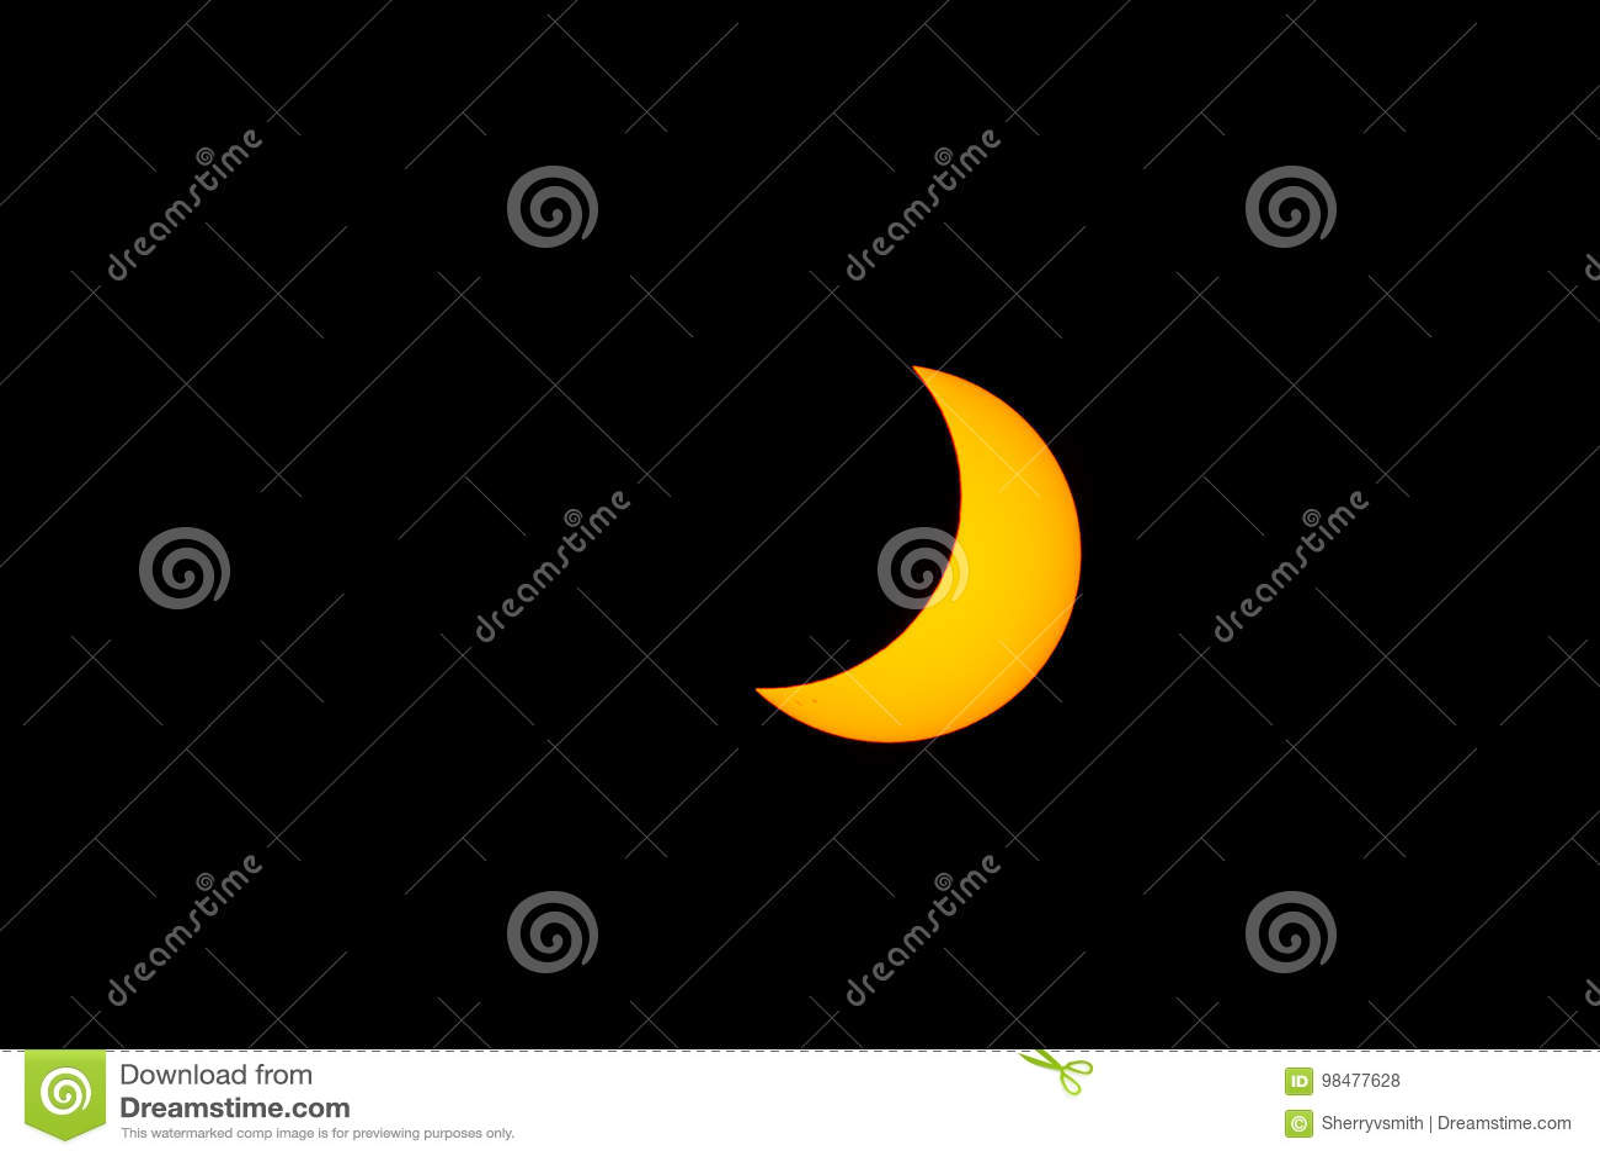 Eclipse solar parcial de San Diego, Califórnia